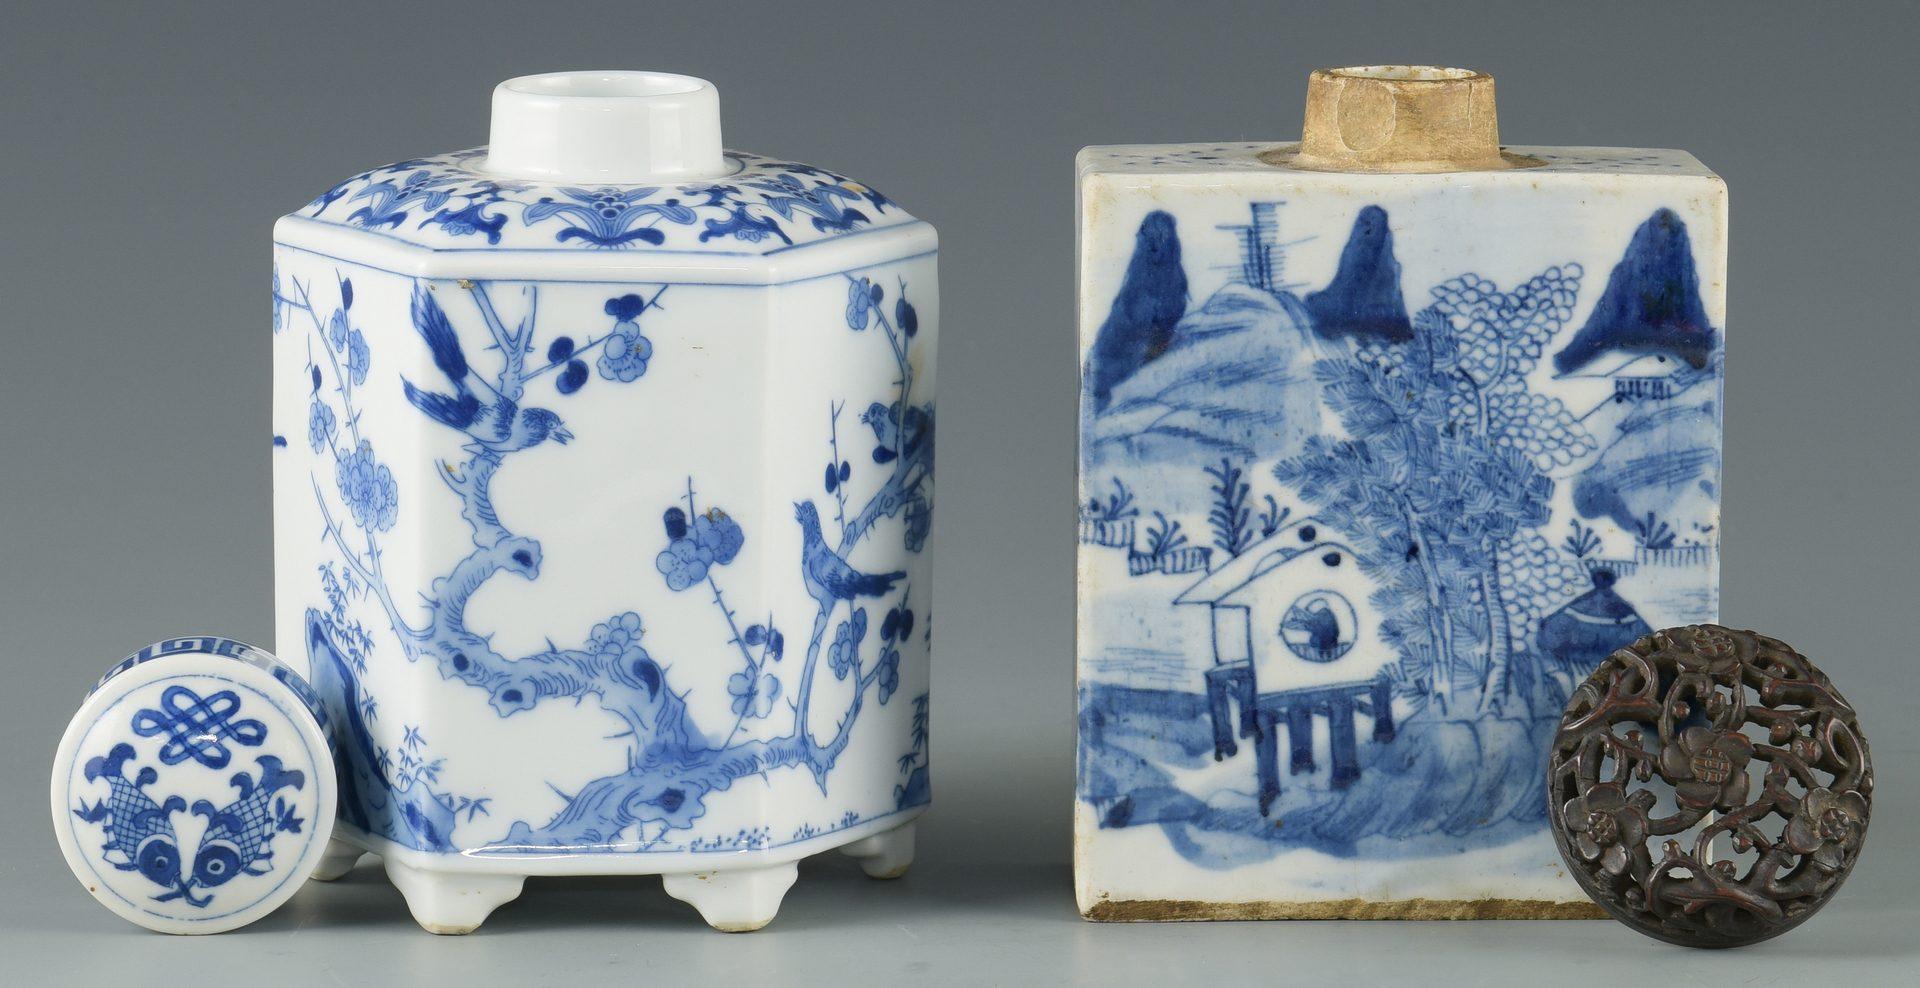 Lot 267: 2 Chinese Porcelain Tea Caddies & 2 Porcelain Jars